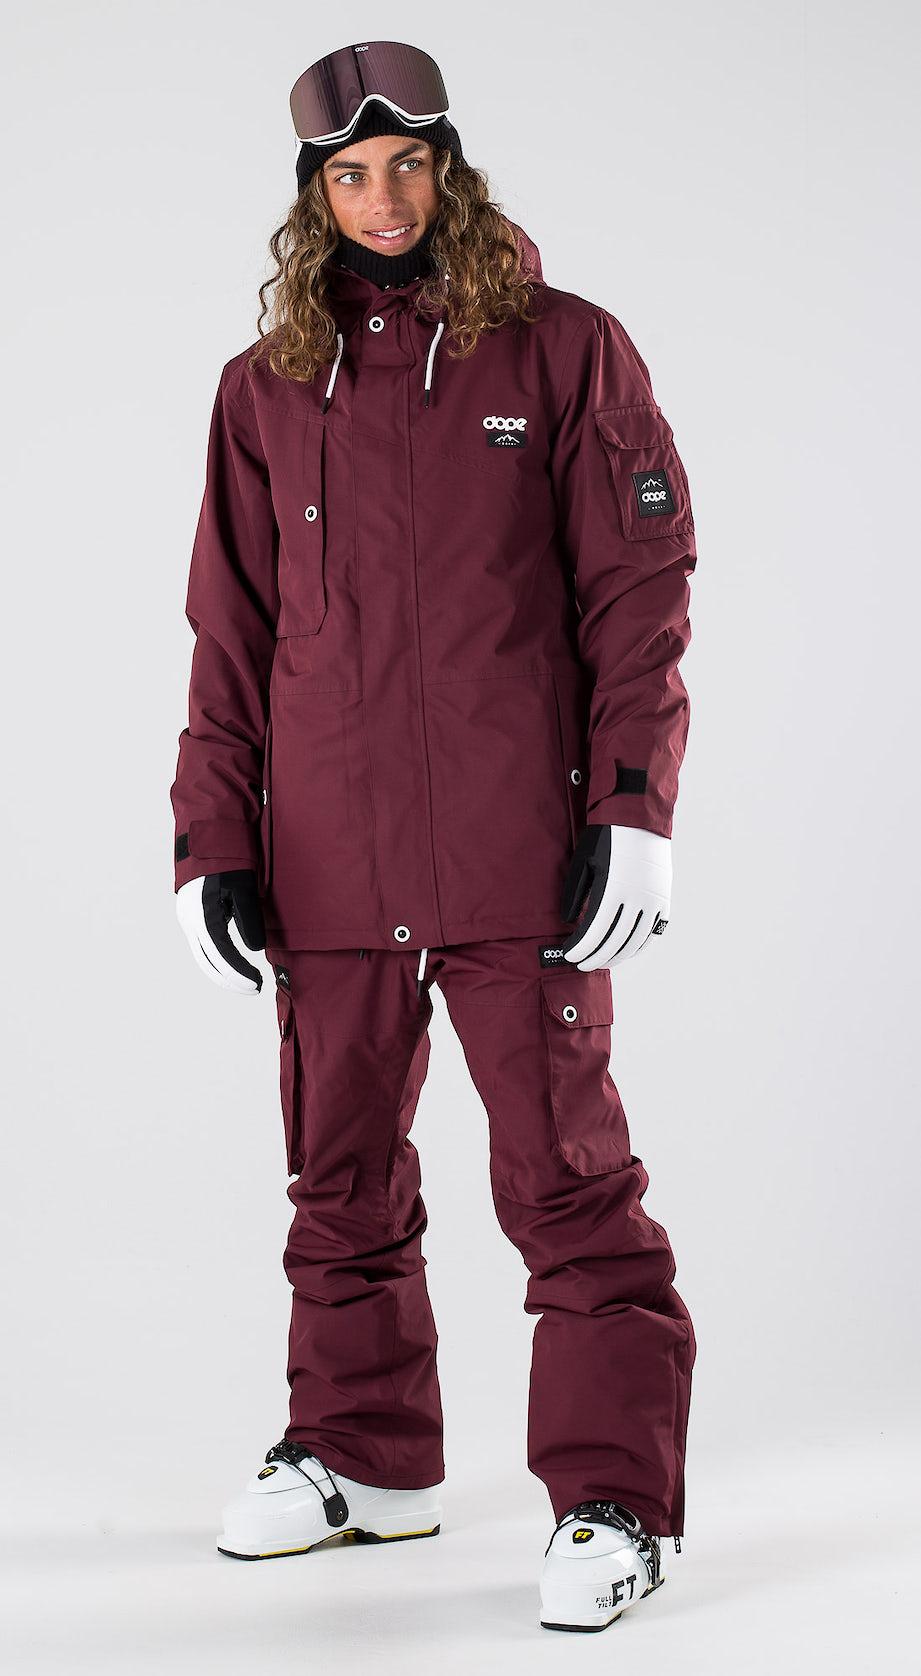 Dope Adept Burgundy Ski clothing Multi